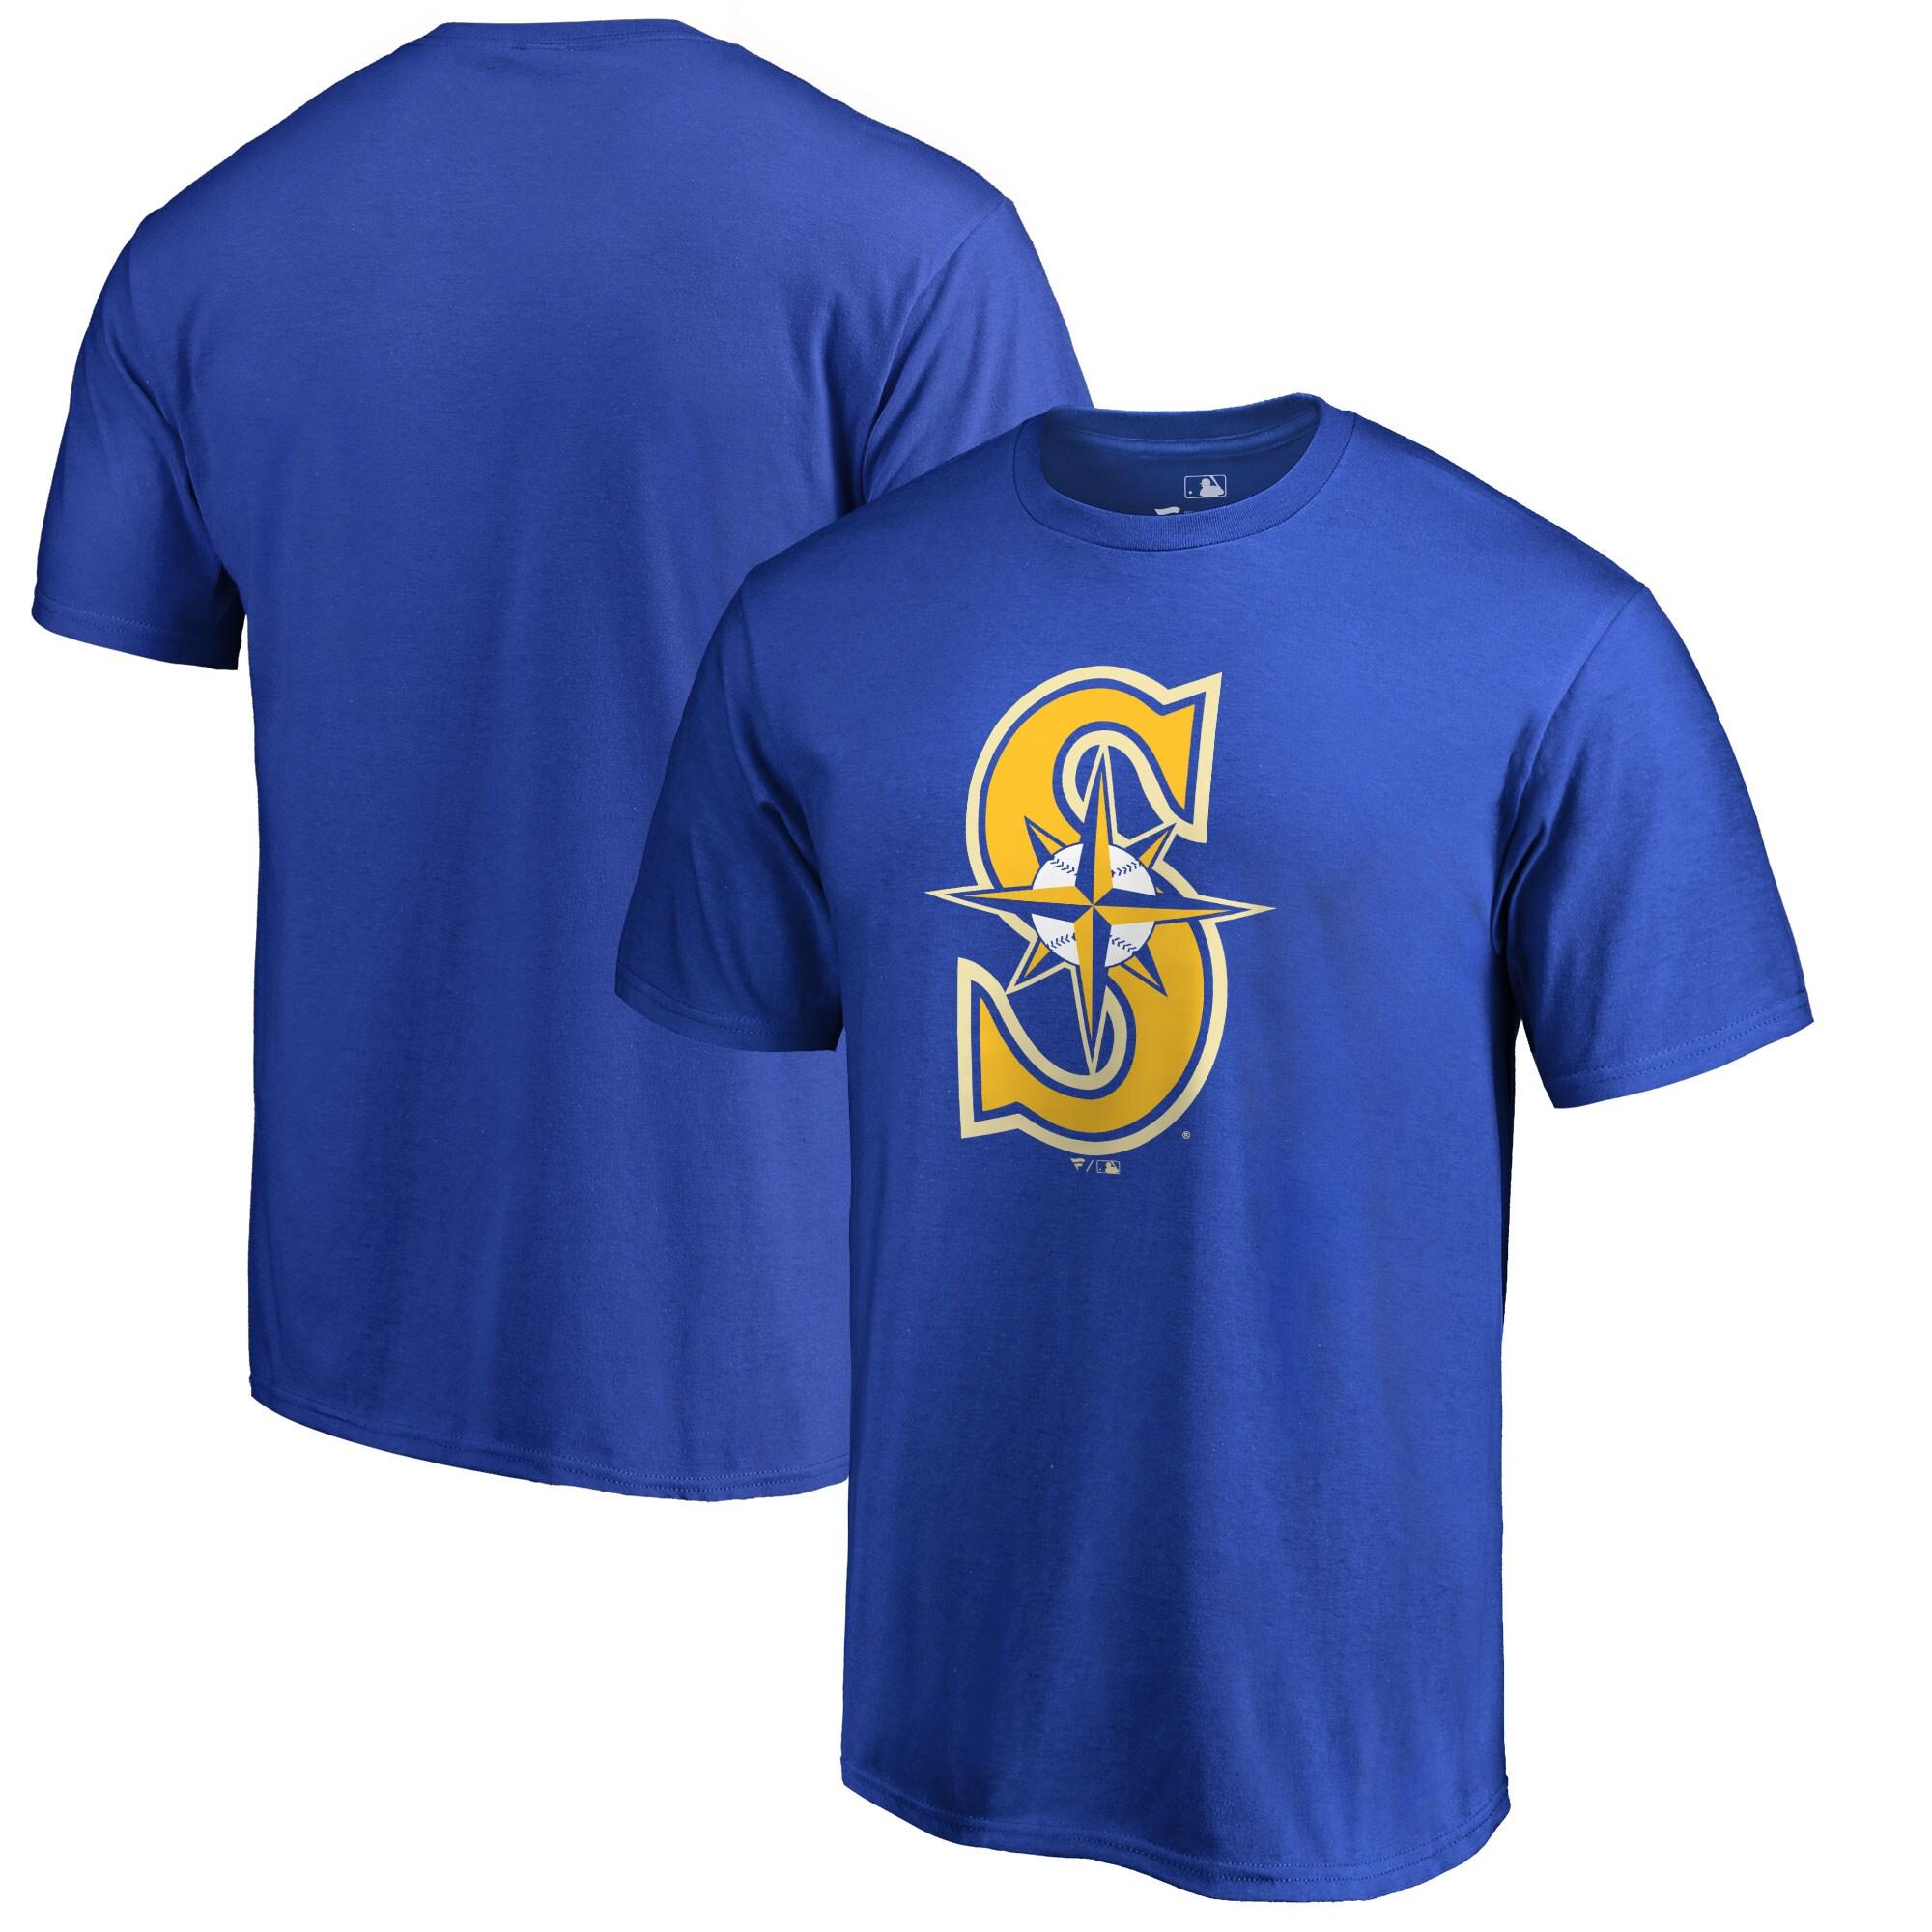 Seattle Mariners Big & Tall Primary Team Logo T-Shirt - Blue